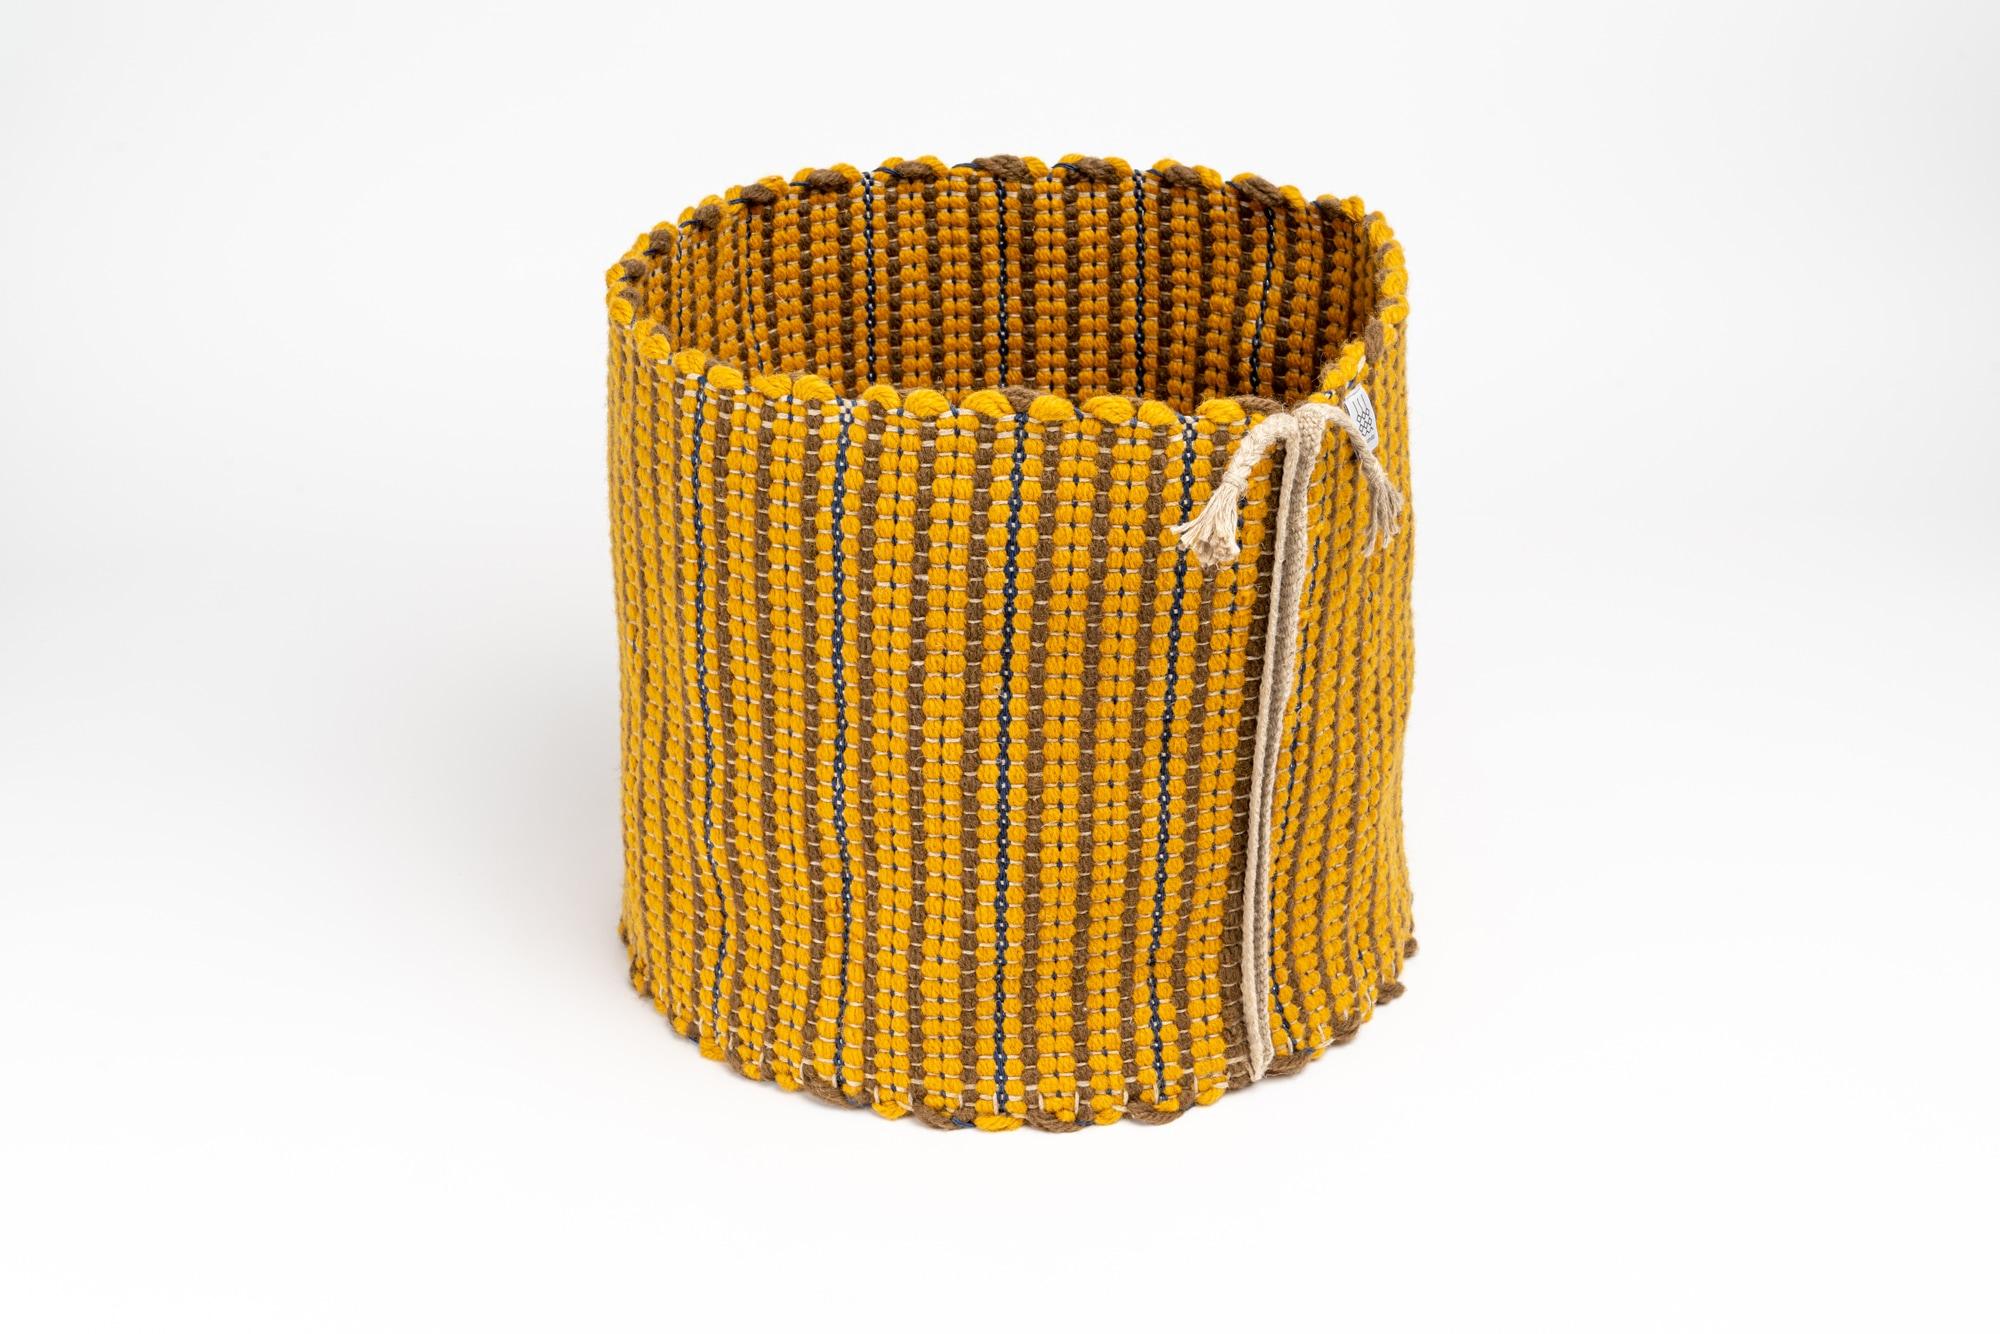 Dschember Korb gelb 1